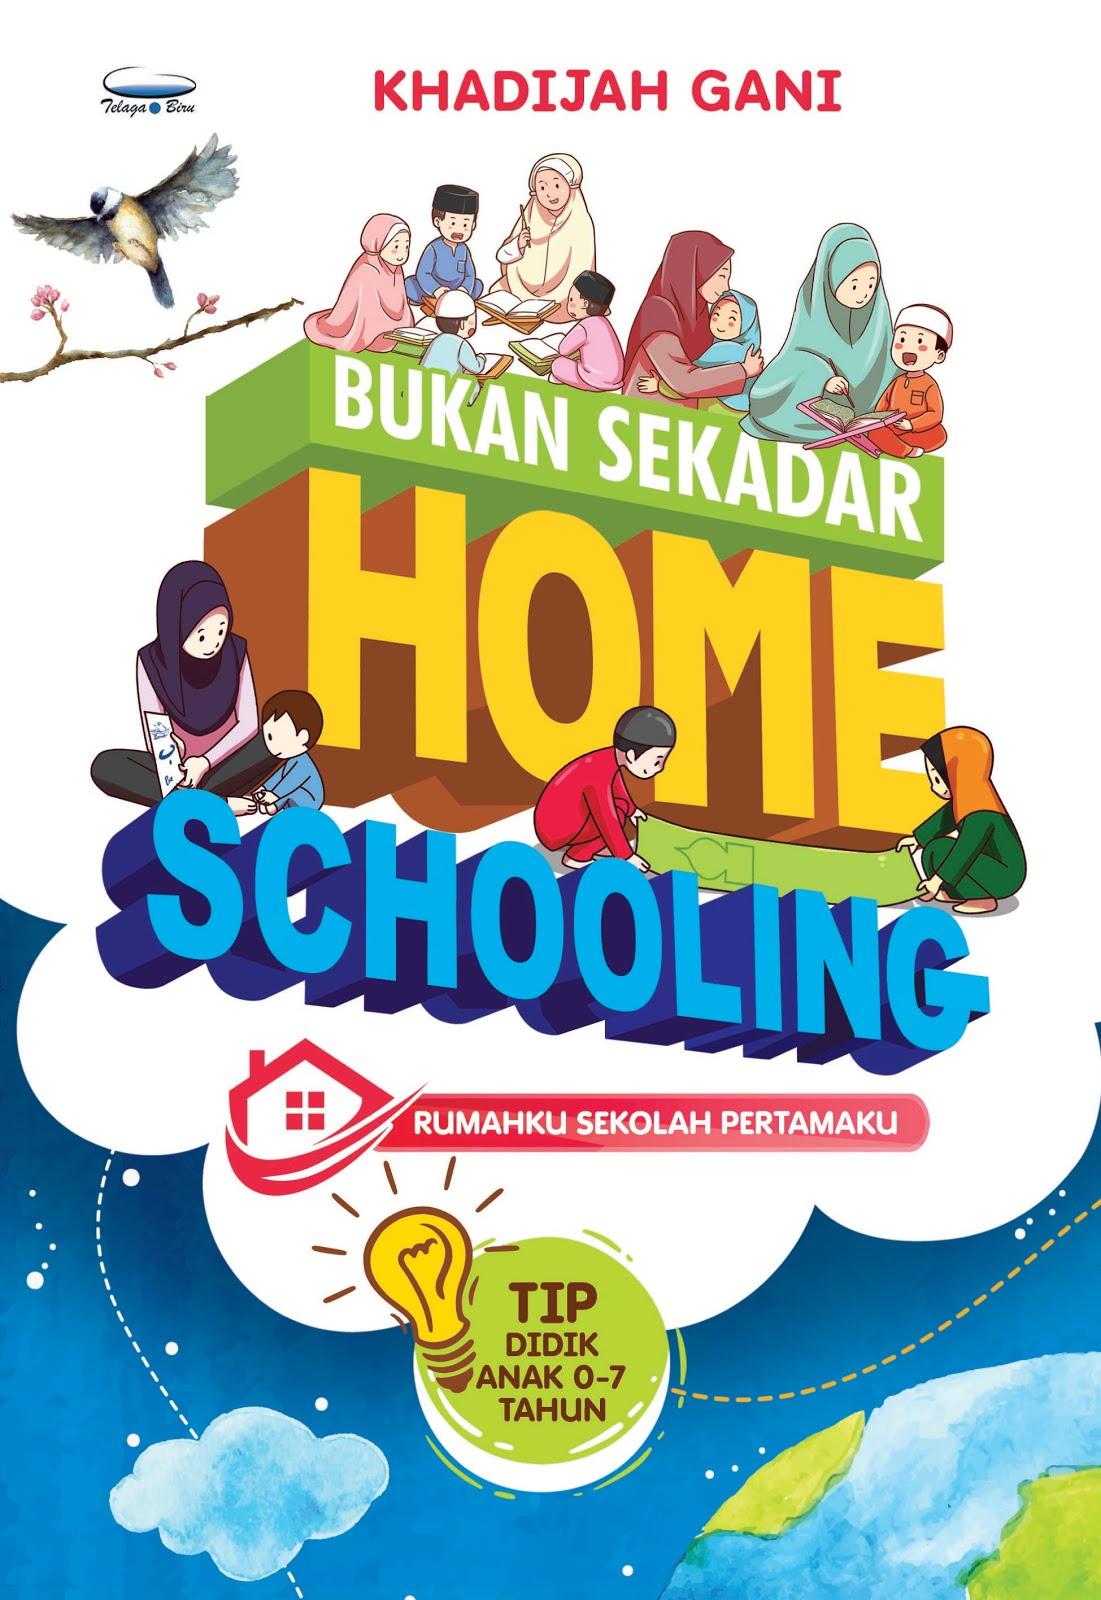 BUKU PERTAMAKU : Bukan Sekadar Homeschooling ~ Rumahku Sekolah Pertamaku